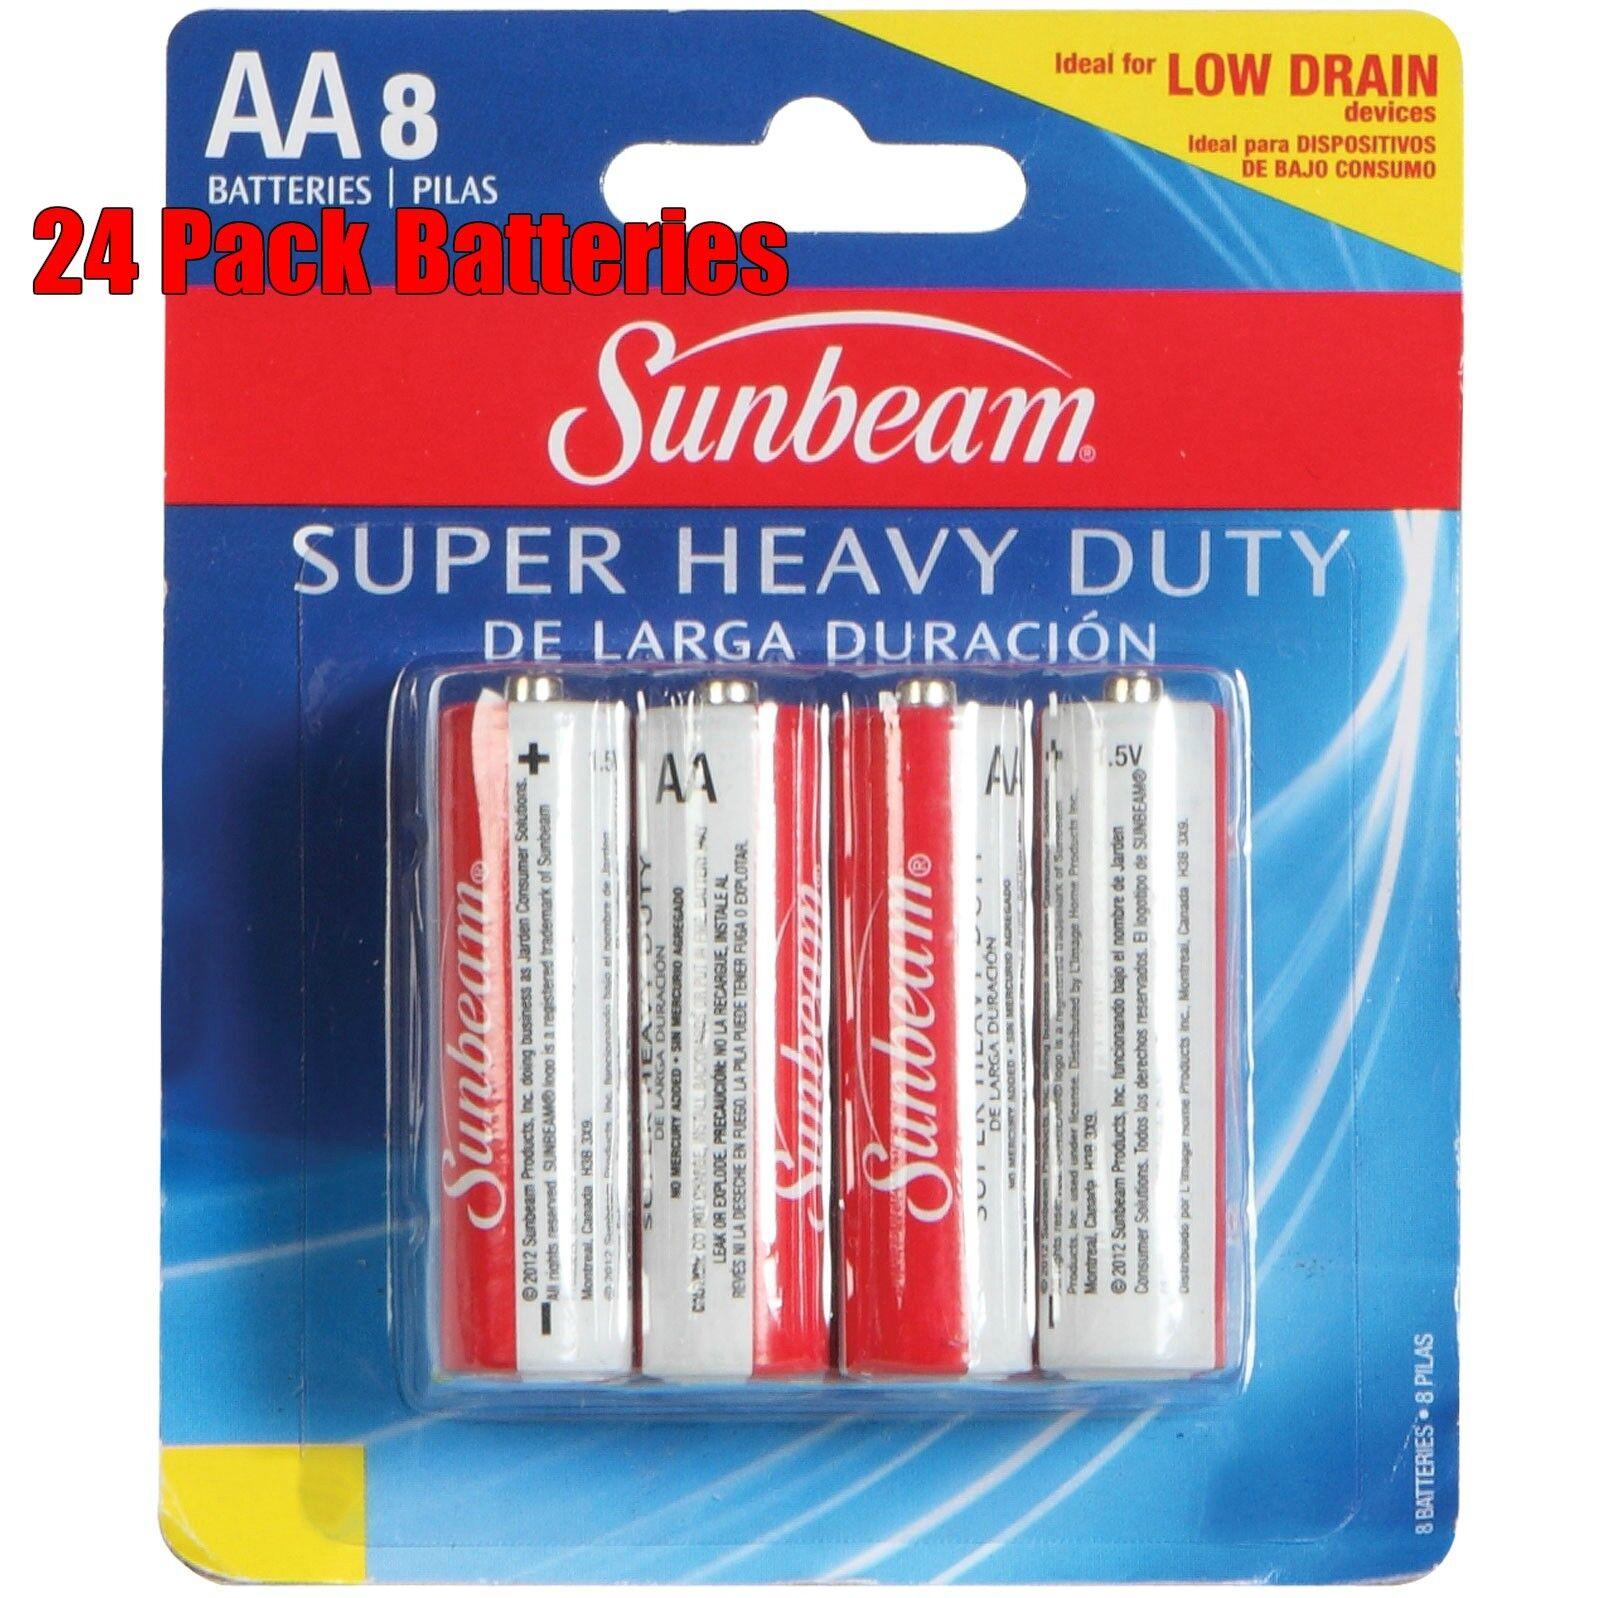 24 Pack Sunbeam AA Alkaline Batteries Extra Heavy Duty 1,5v